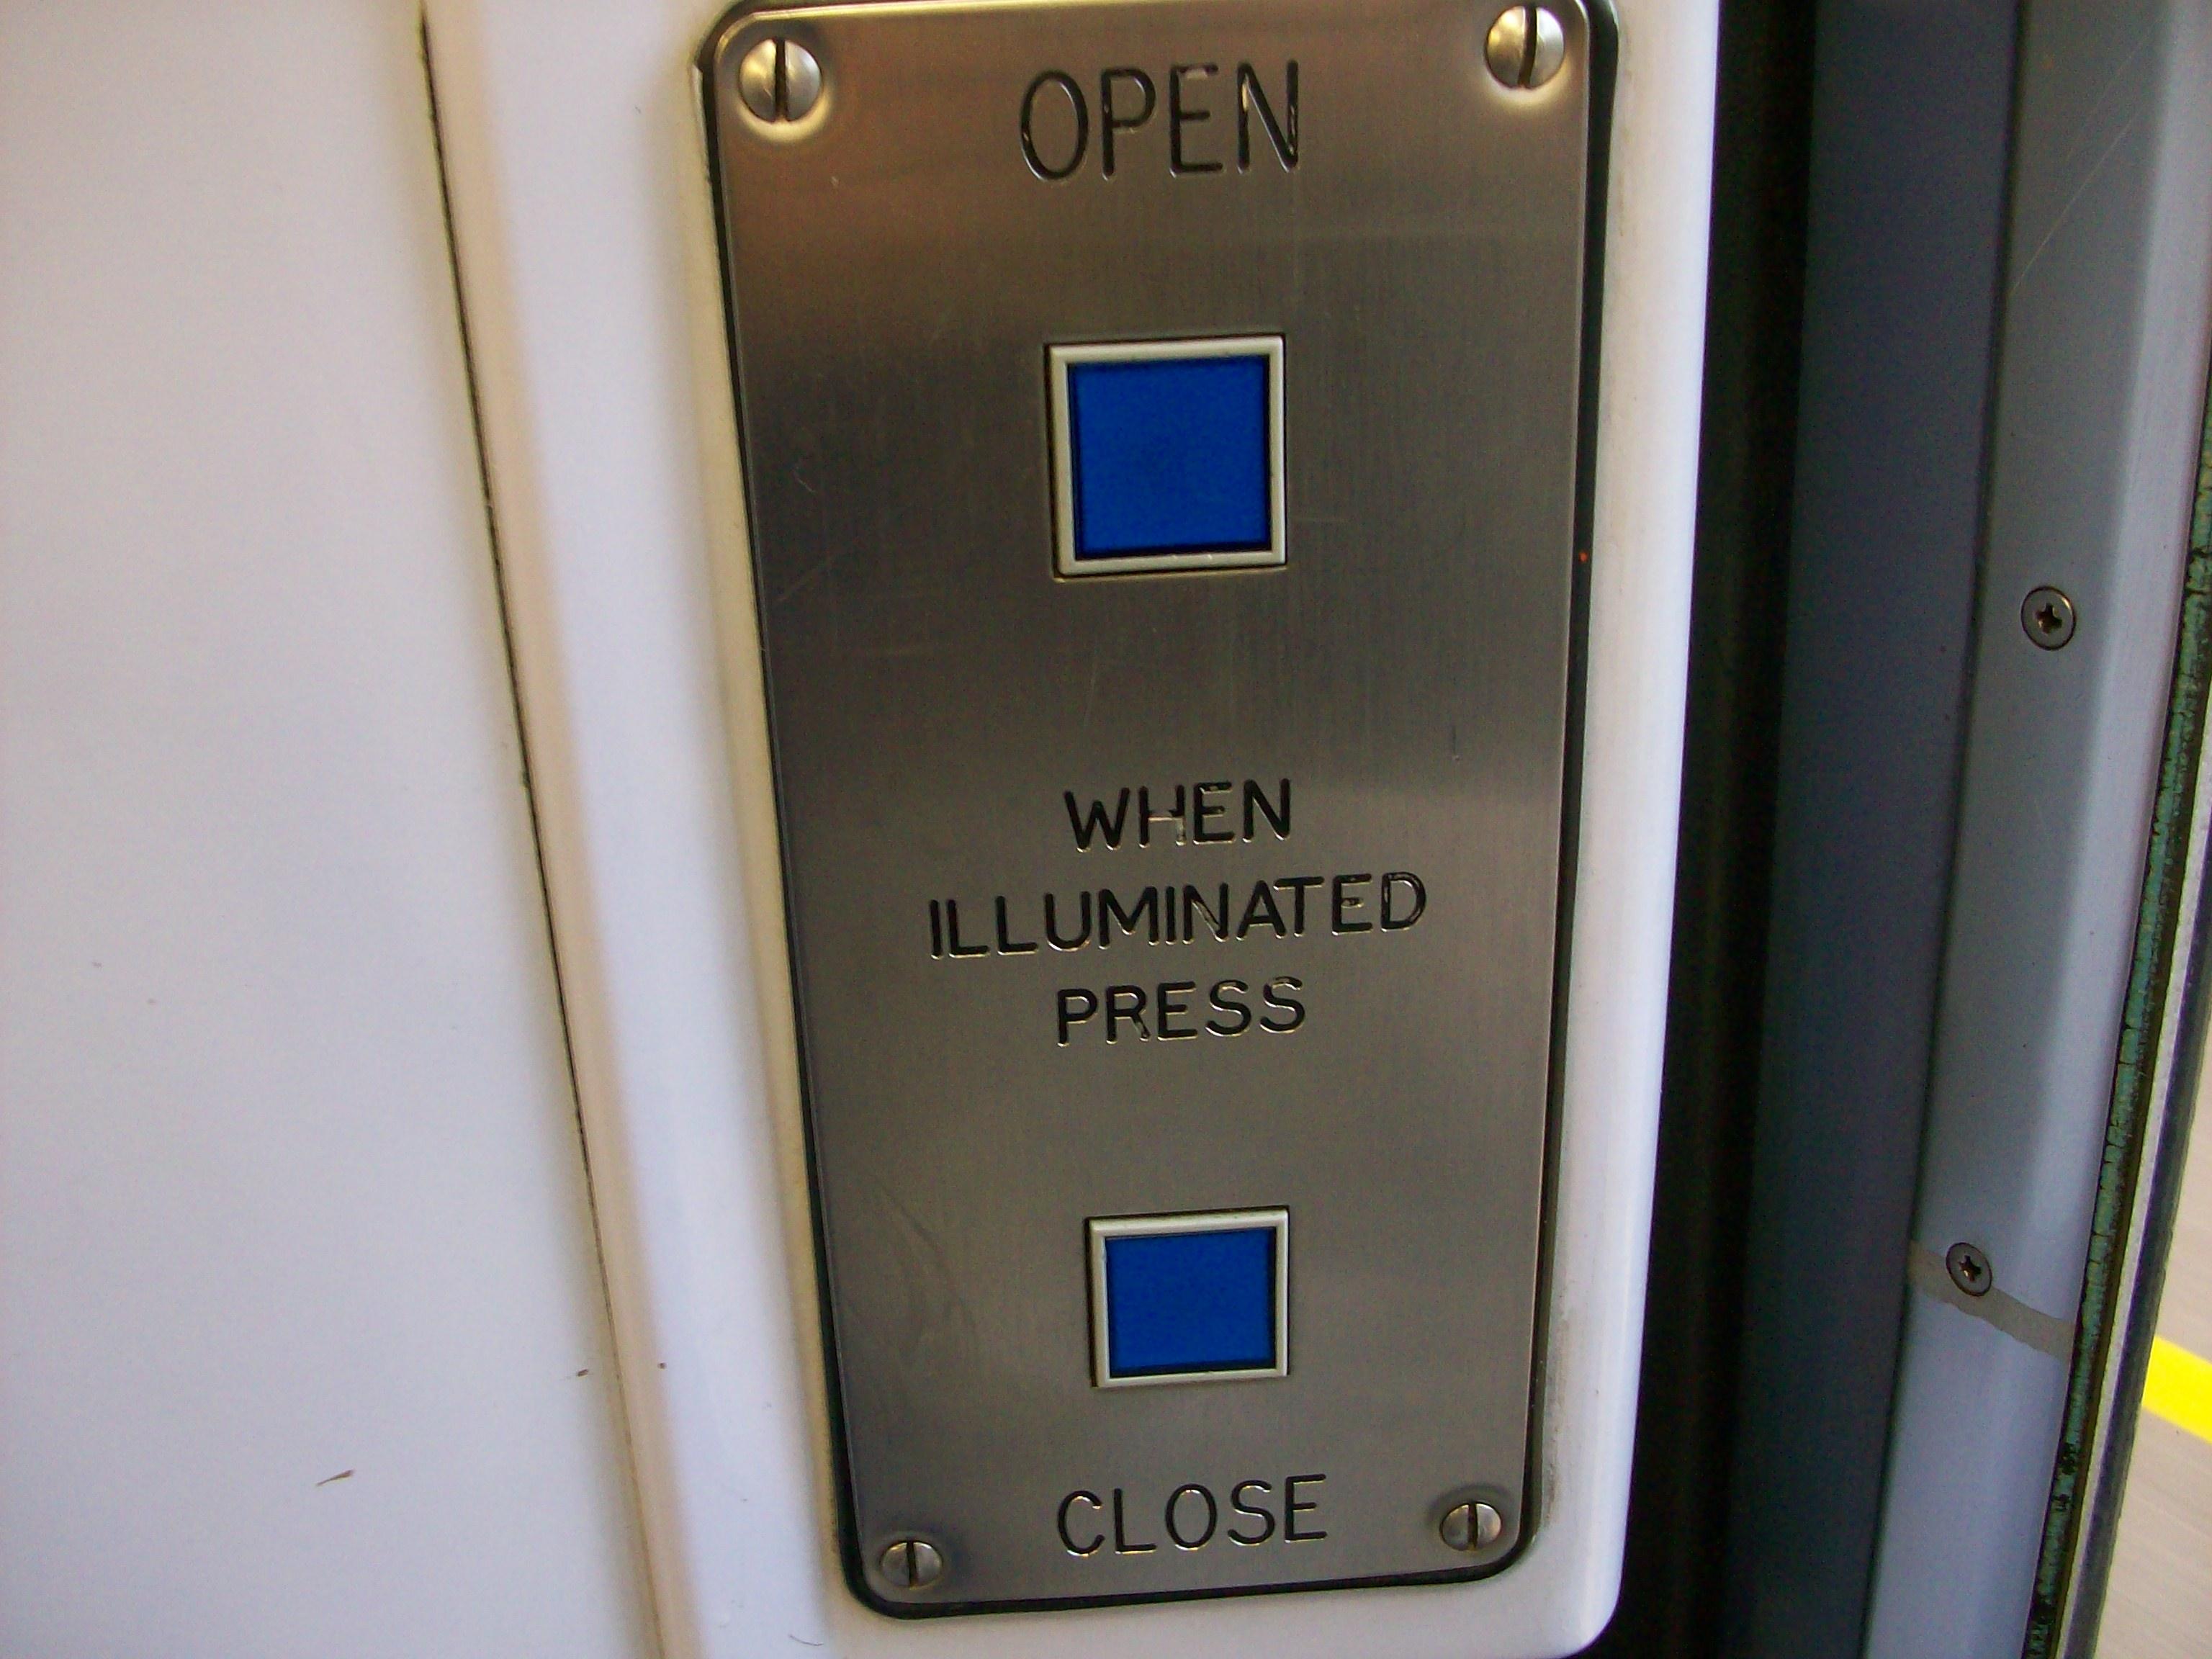 File:Class 150 blue door buttons unlit.jpg & File:Class 150 blue door buttons unlit.jpg - Wikimedia Commons Pezcame.Com